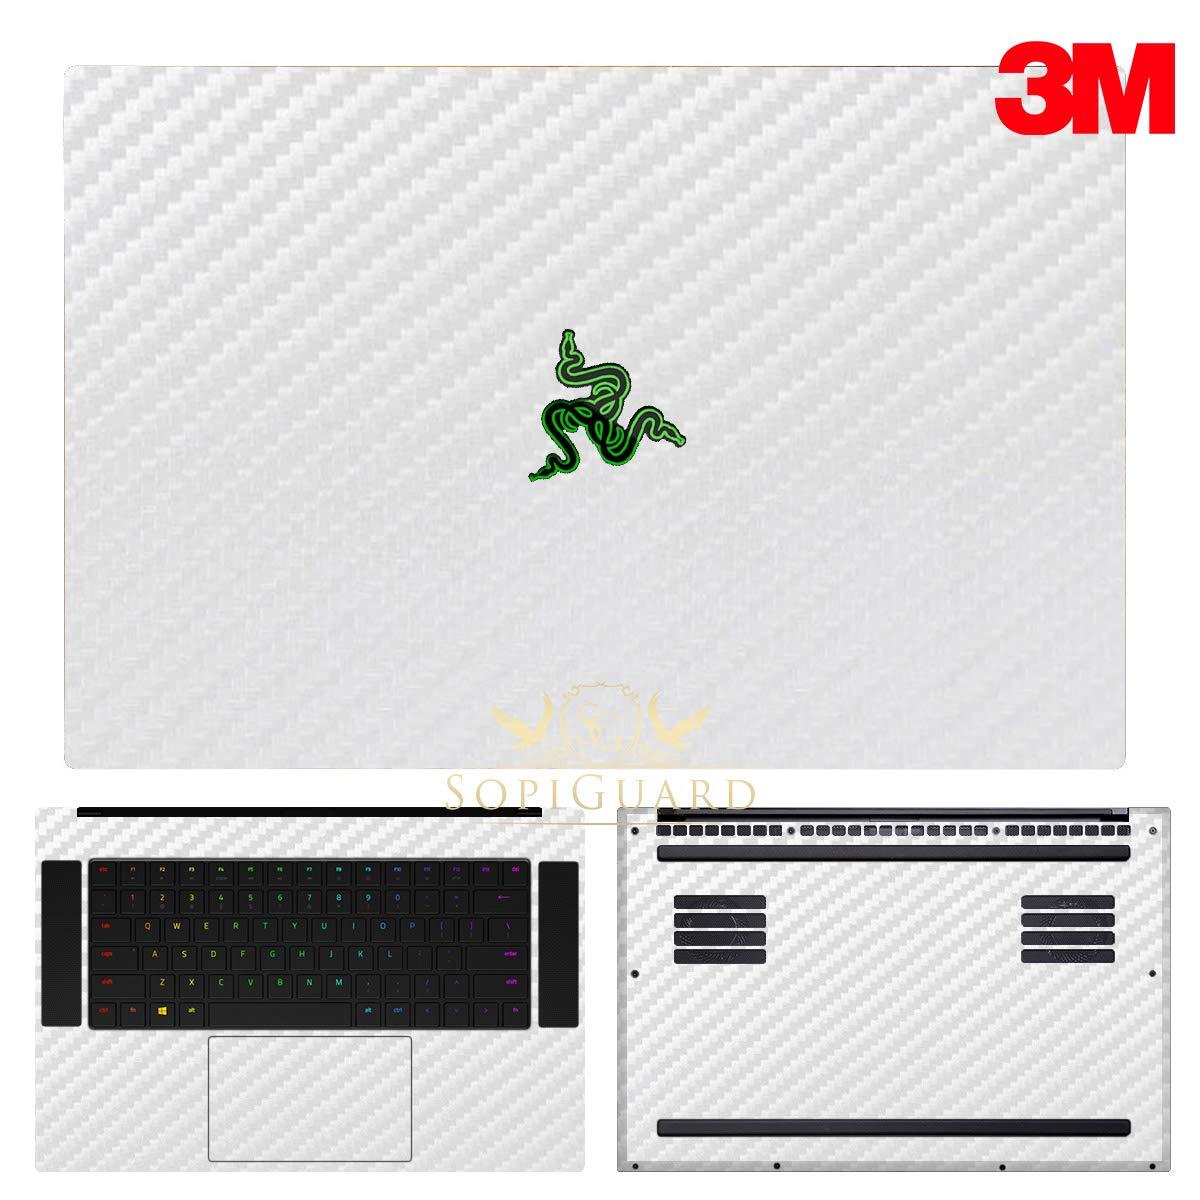 SopiGuard 3M Carbon White Full Body Precision Edge-to-Edge Coverage Vinyl Sticker Skin for 2018 Razer Blade 15.6 inch (Base Model)